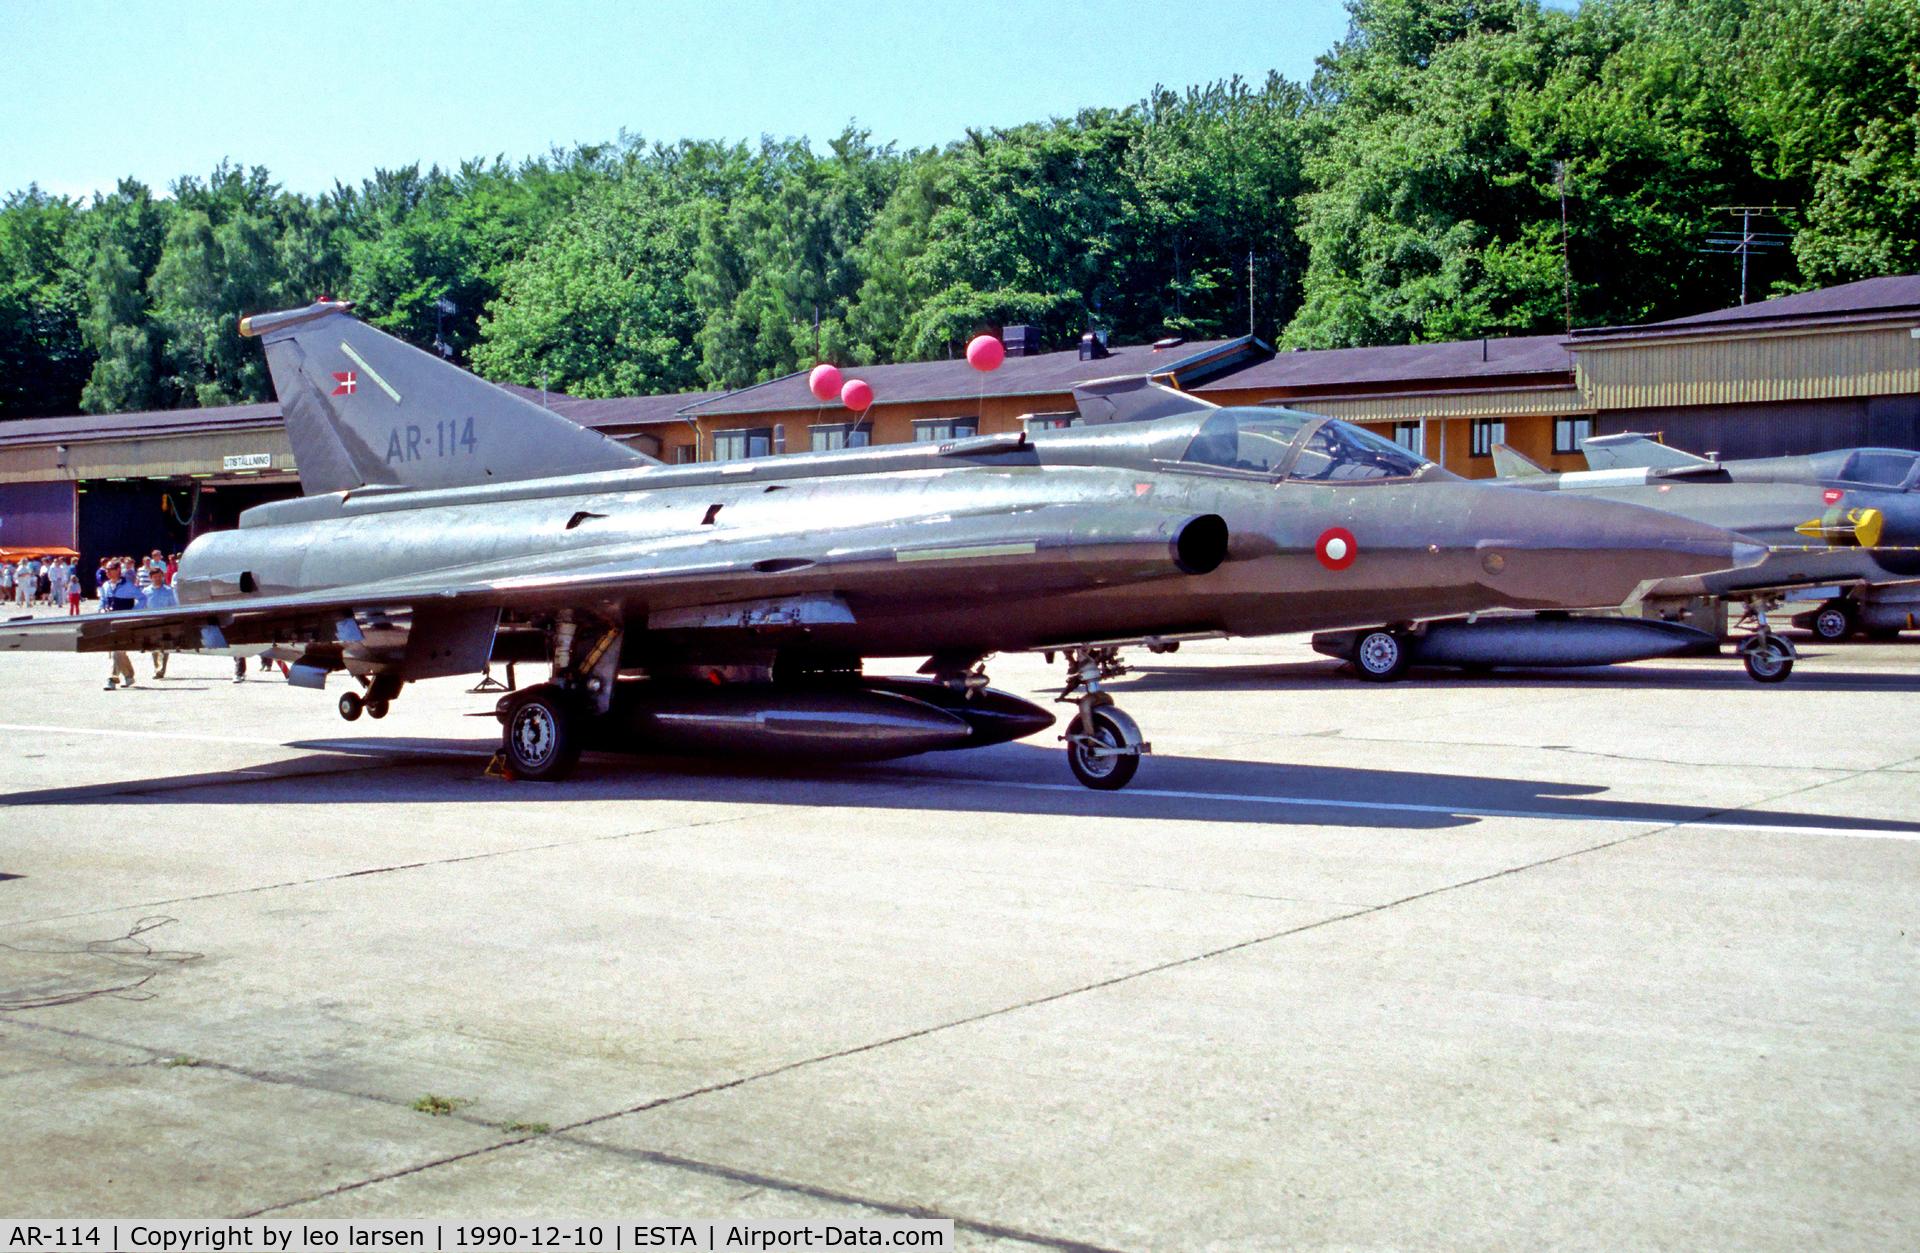 AR-114, Saab RF-35 Draken C/N 35-1114, Aengelholm Sweden 10.6.90